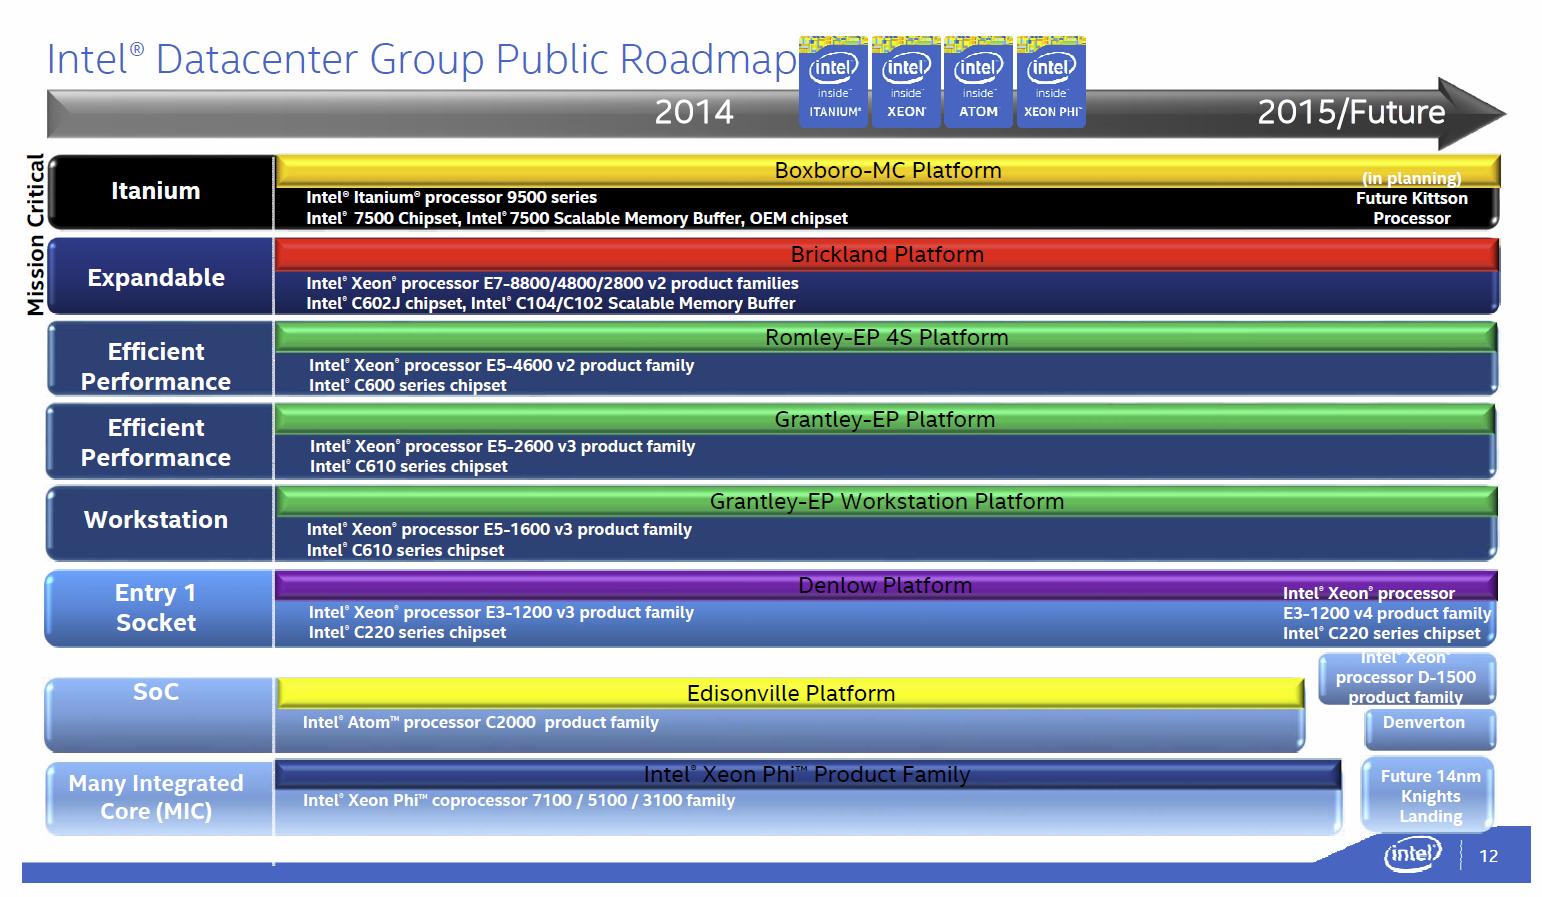 Intel-Roadmap mit Kittson in 2015/Future